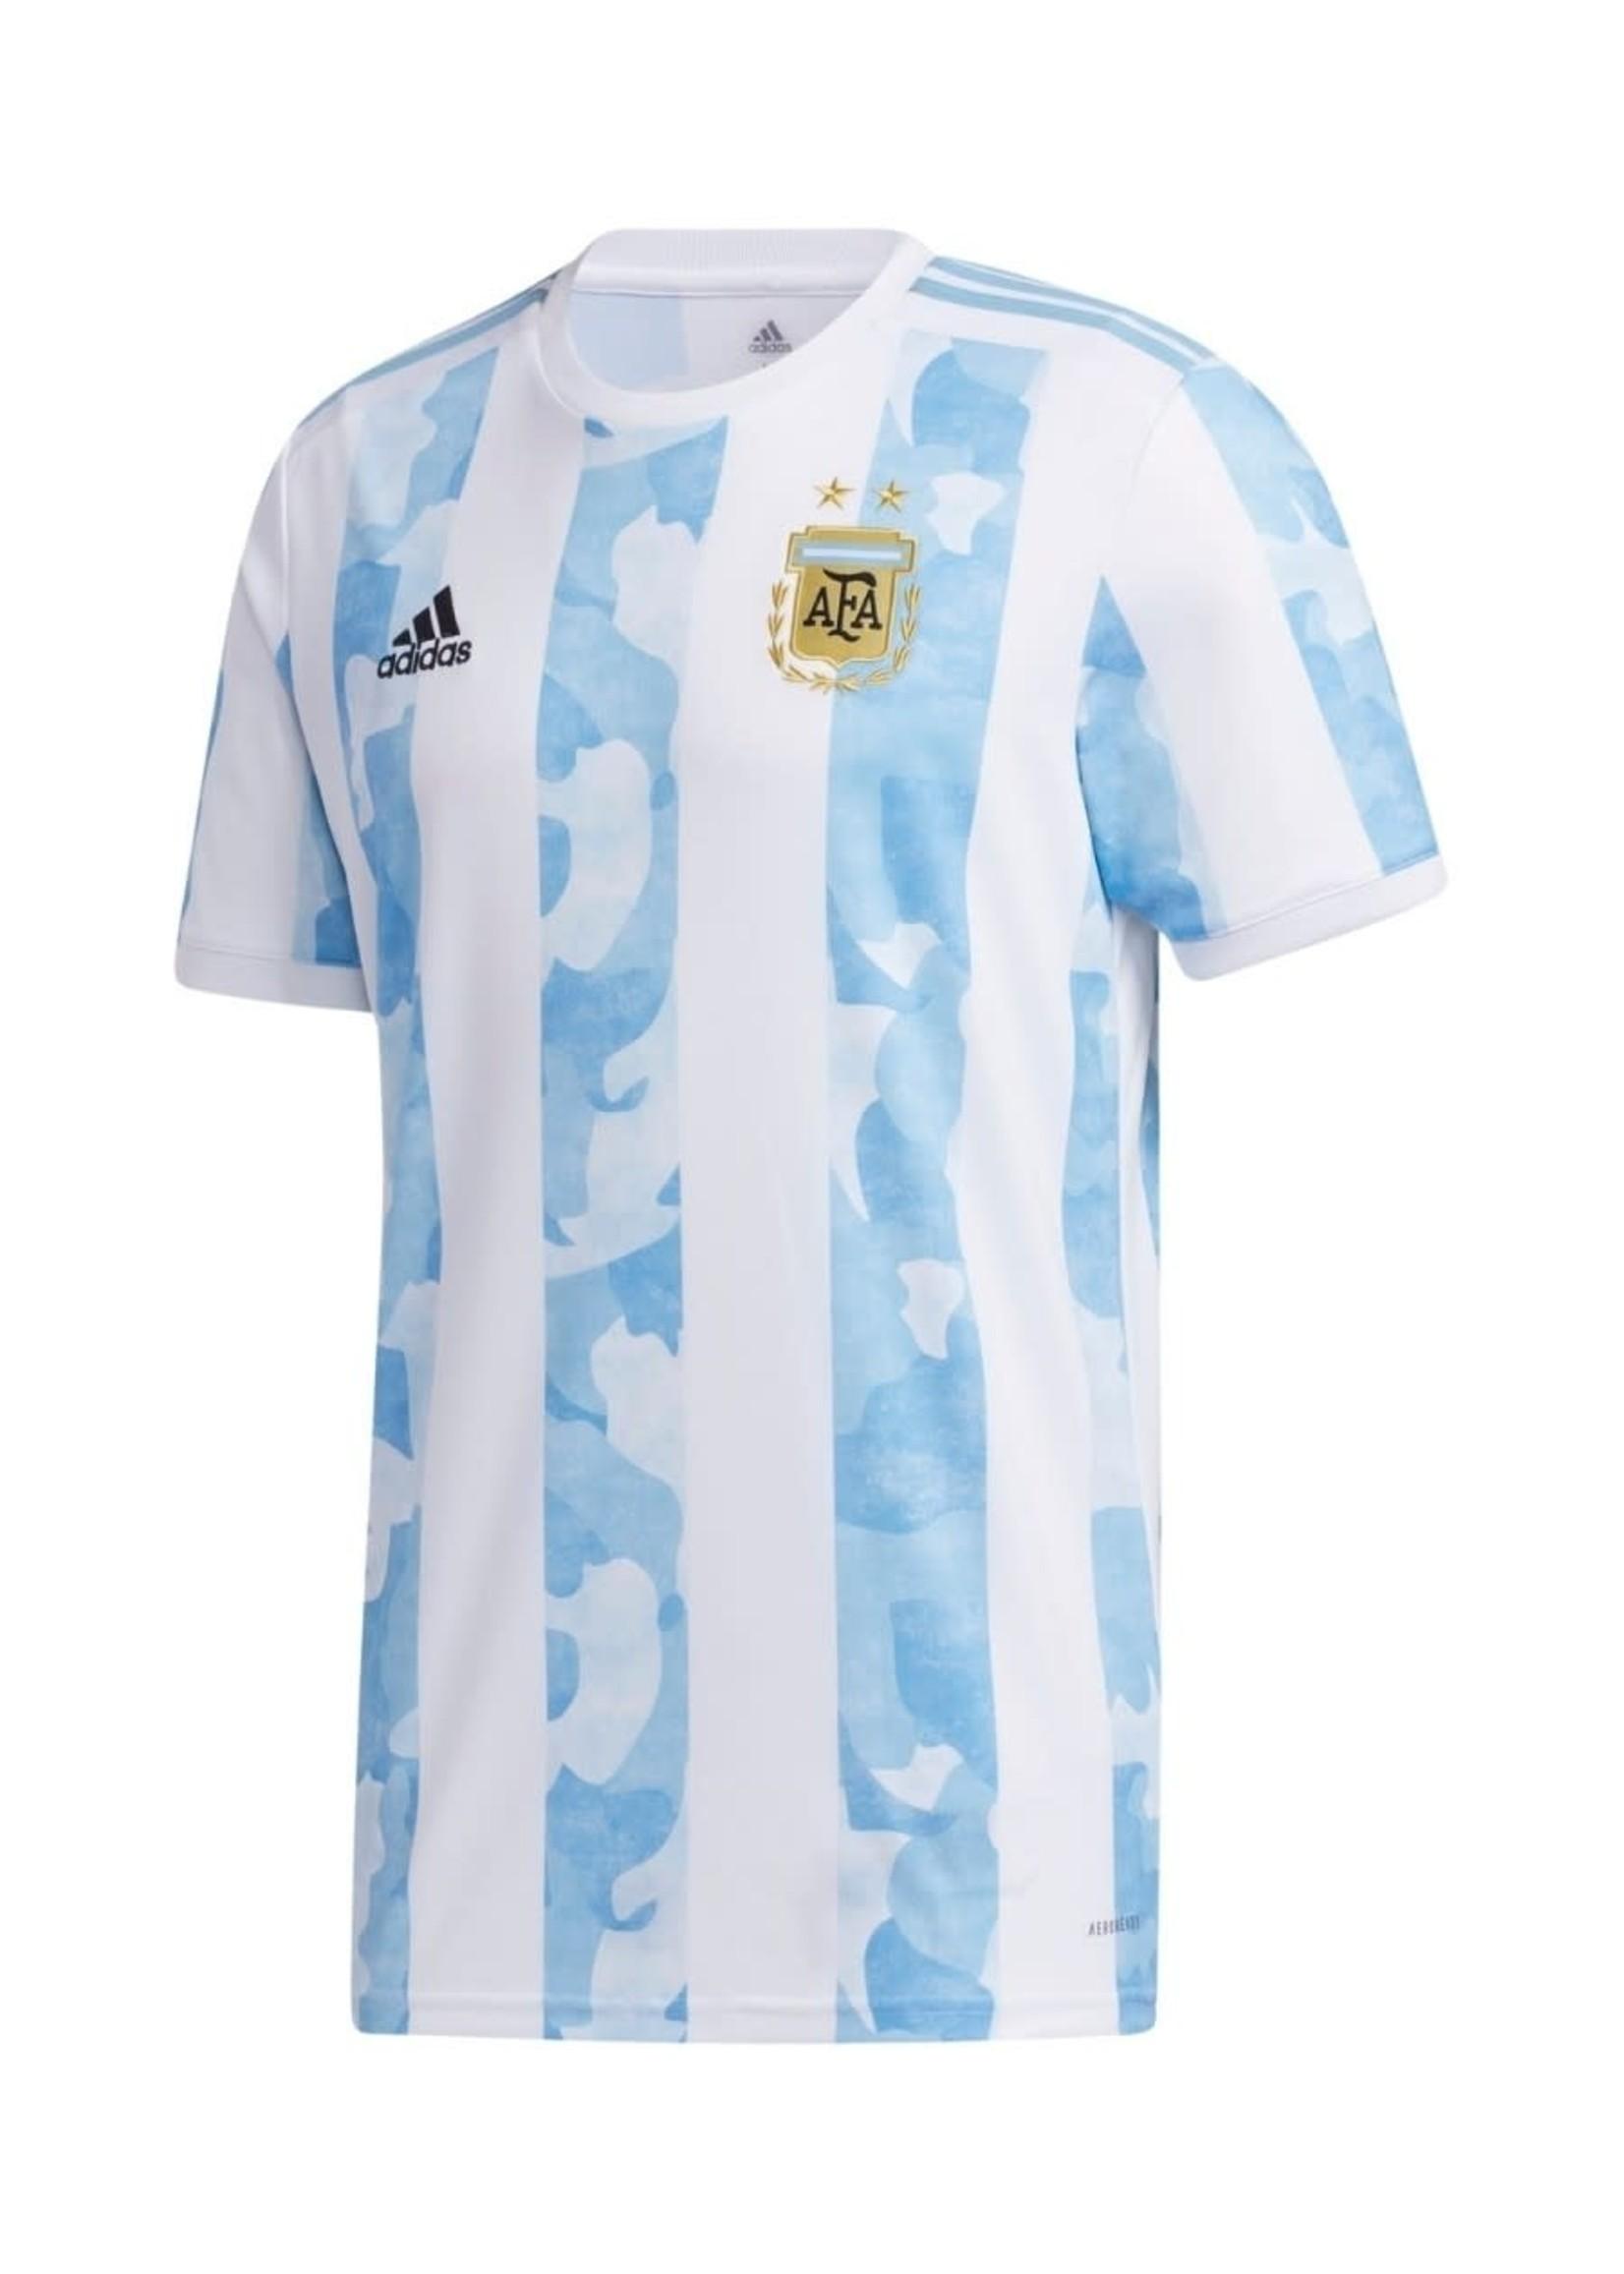 Adidas ARGENTINA HOME JERSEY 20/21